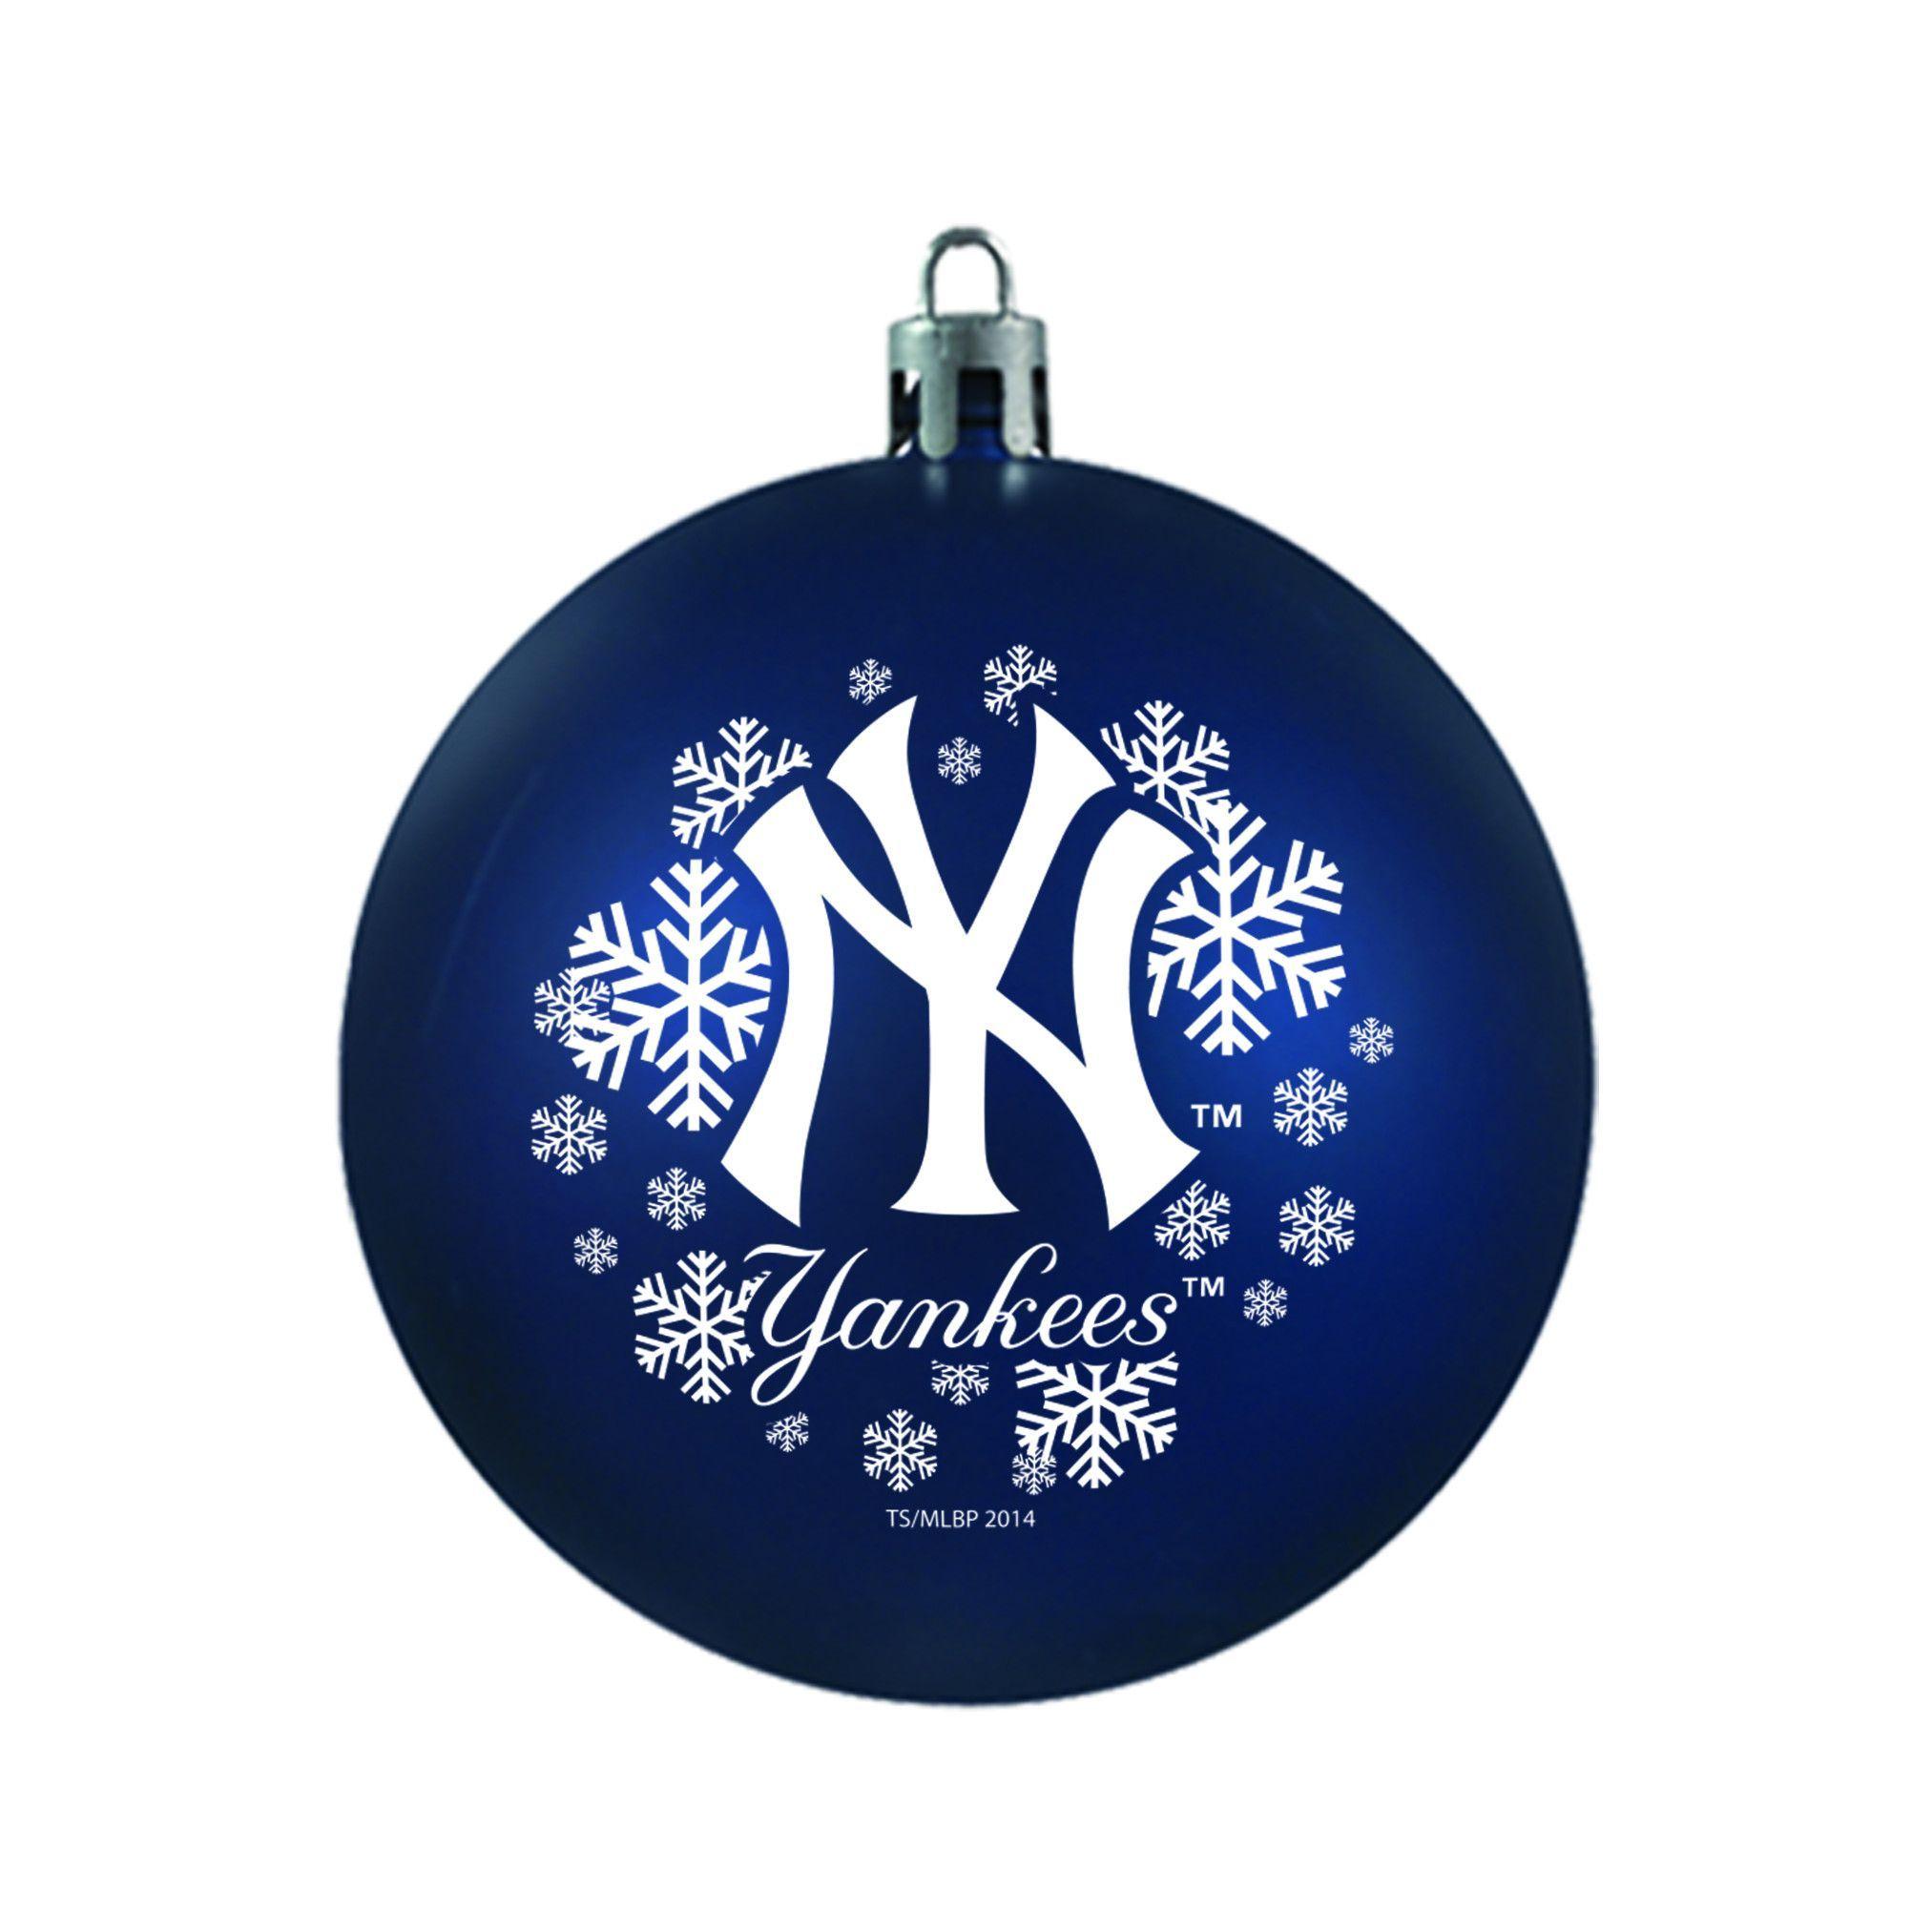 New! New York Yankees Topperscott Shatterproof Ornament ...